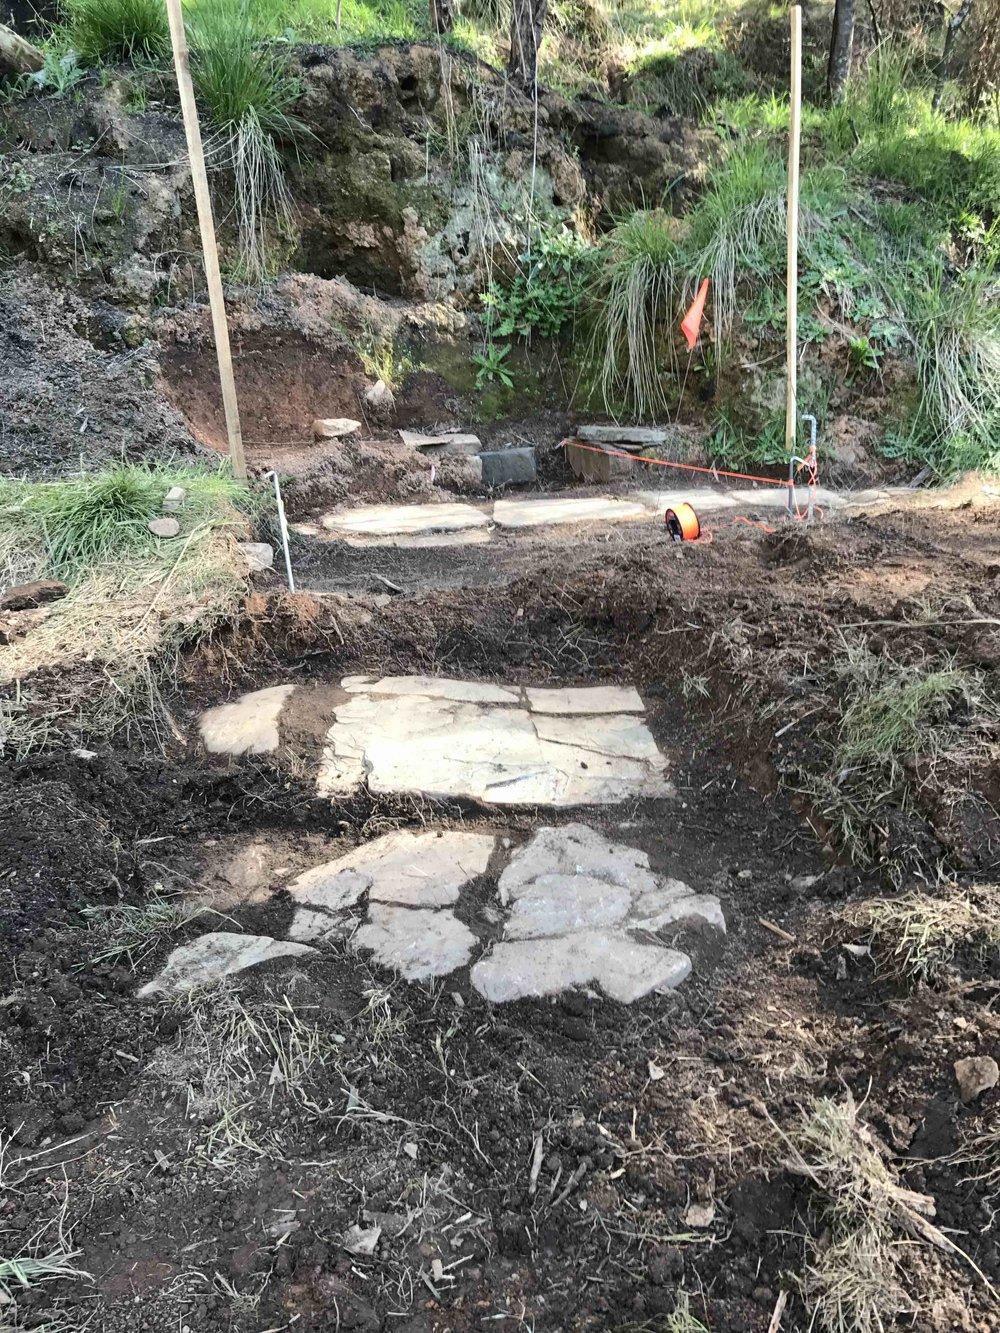 Stone Feature 1 - More stone flooring revealed (photo: Melissa Dunk)